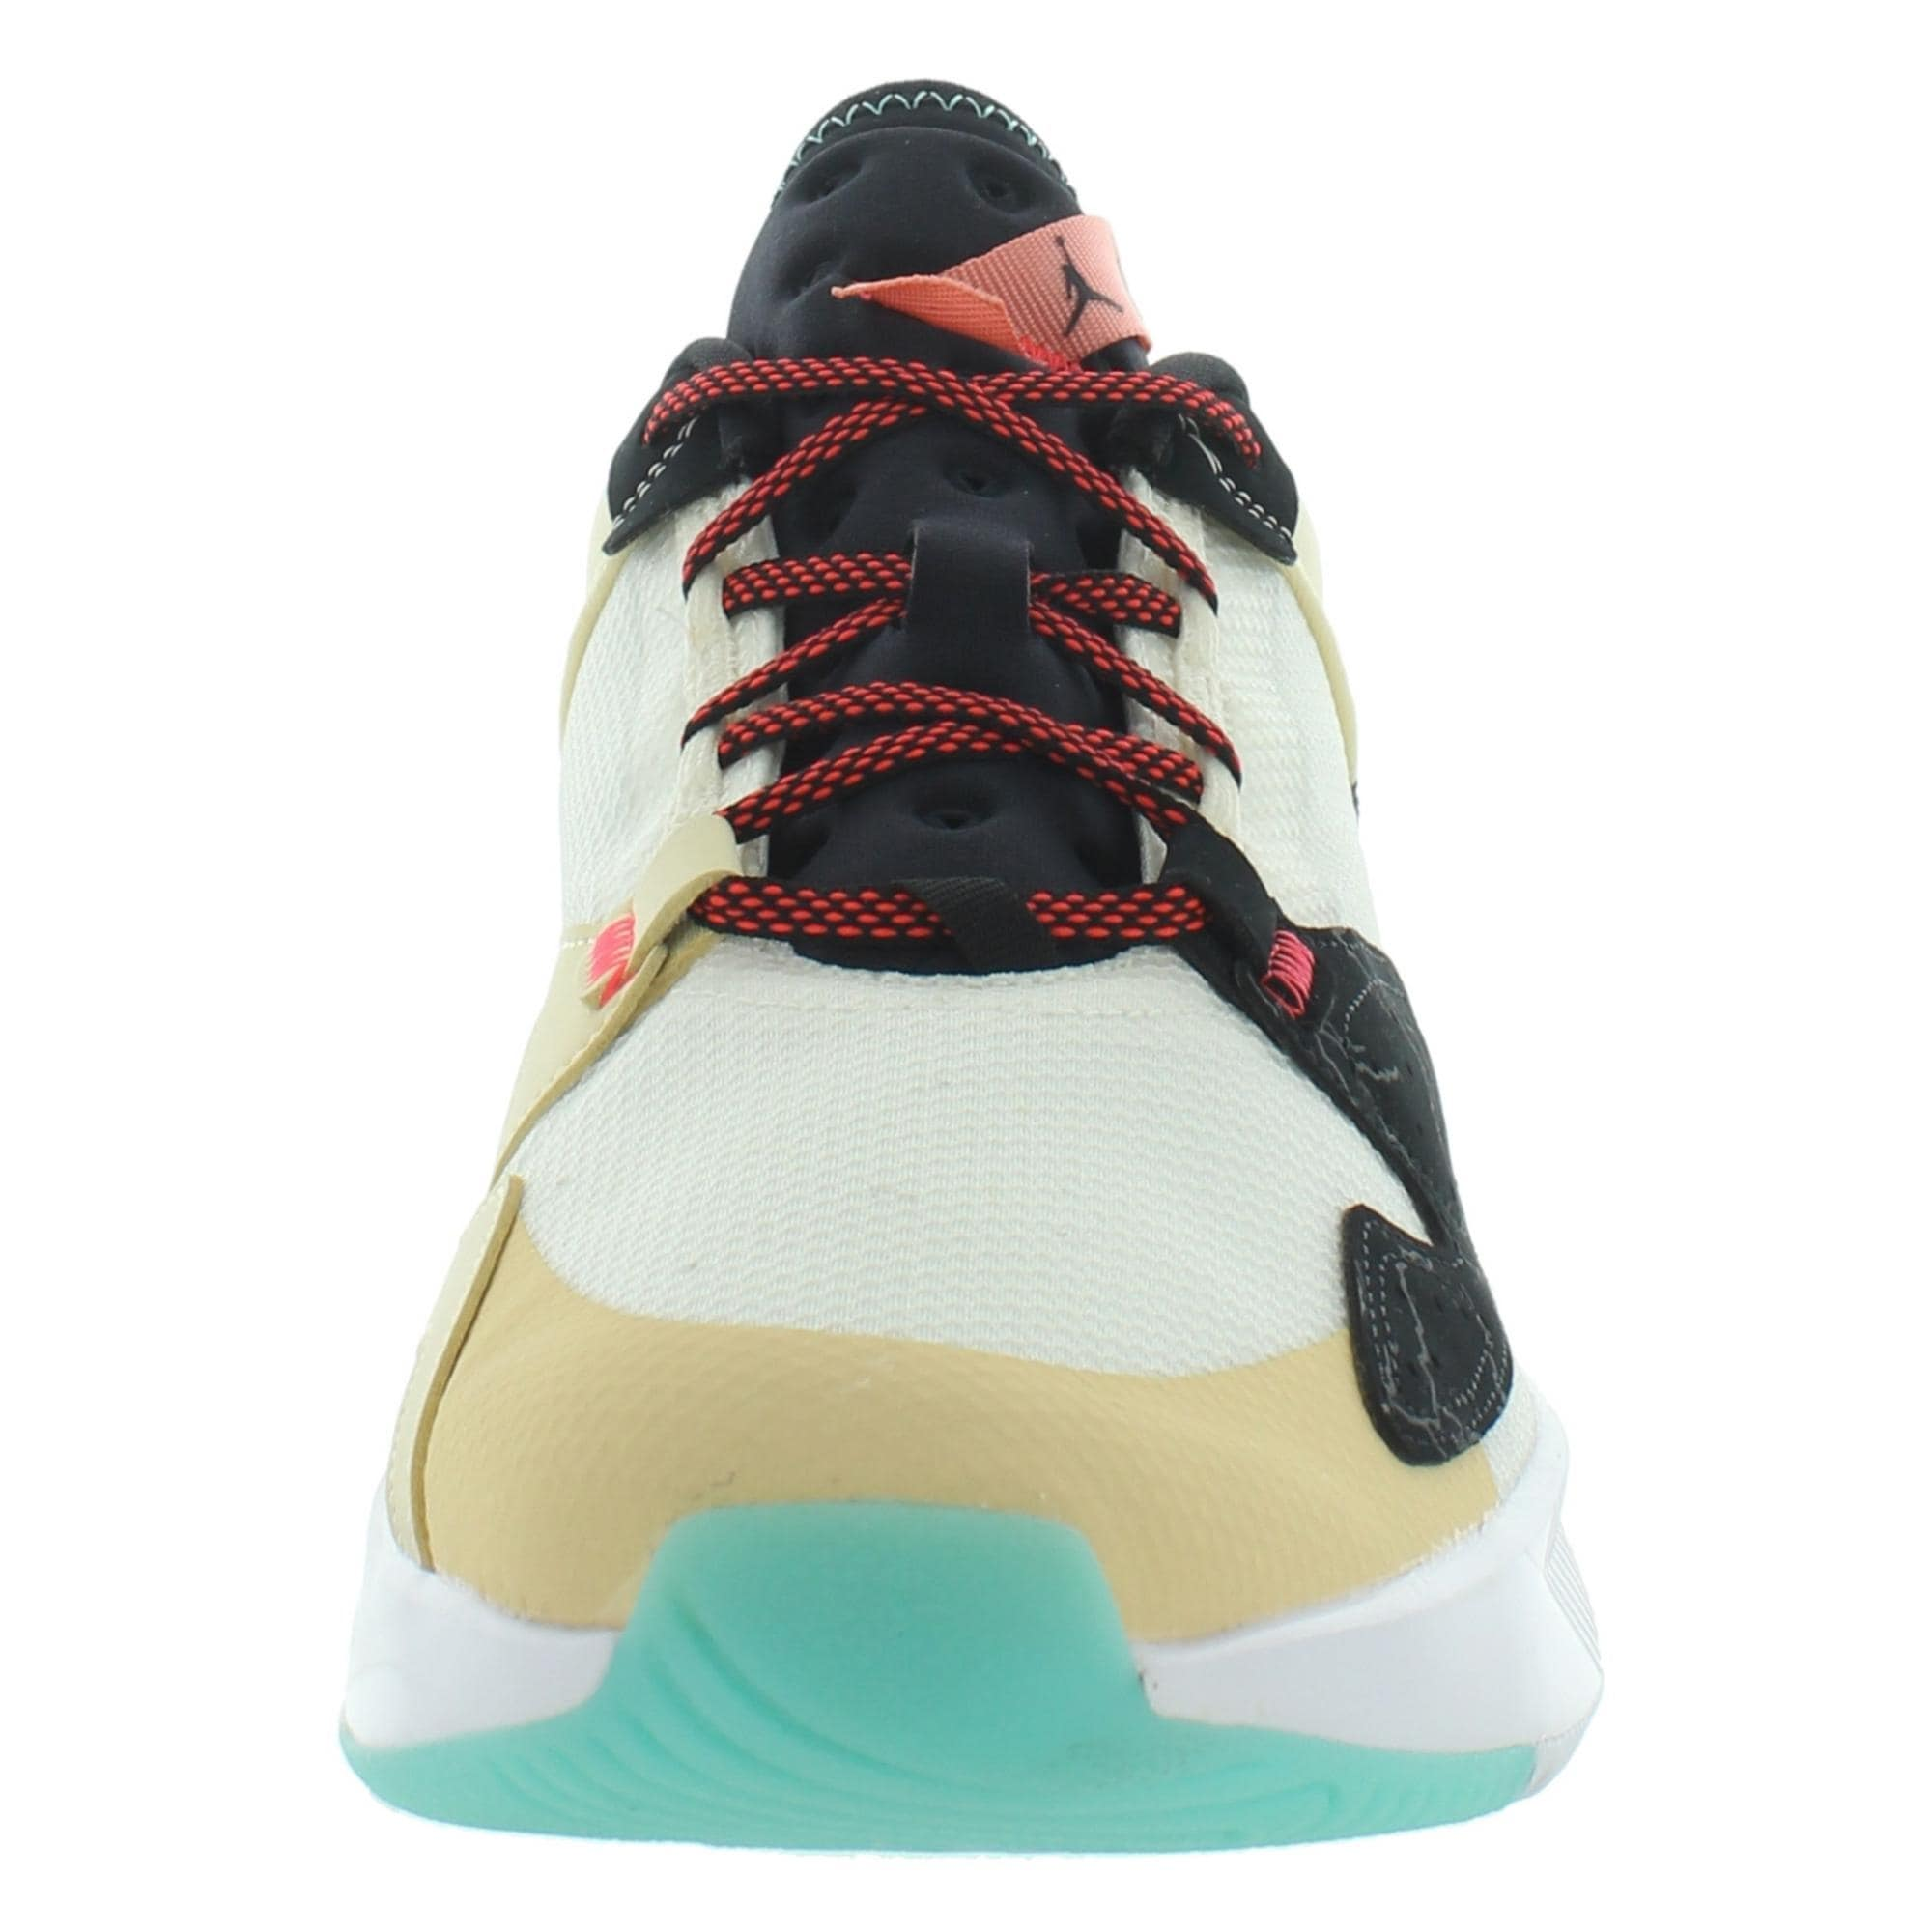 Nike Mens Jordan Air Cadence SNC Running Shoes Workout Gym - Pale Ivory/Black